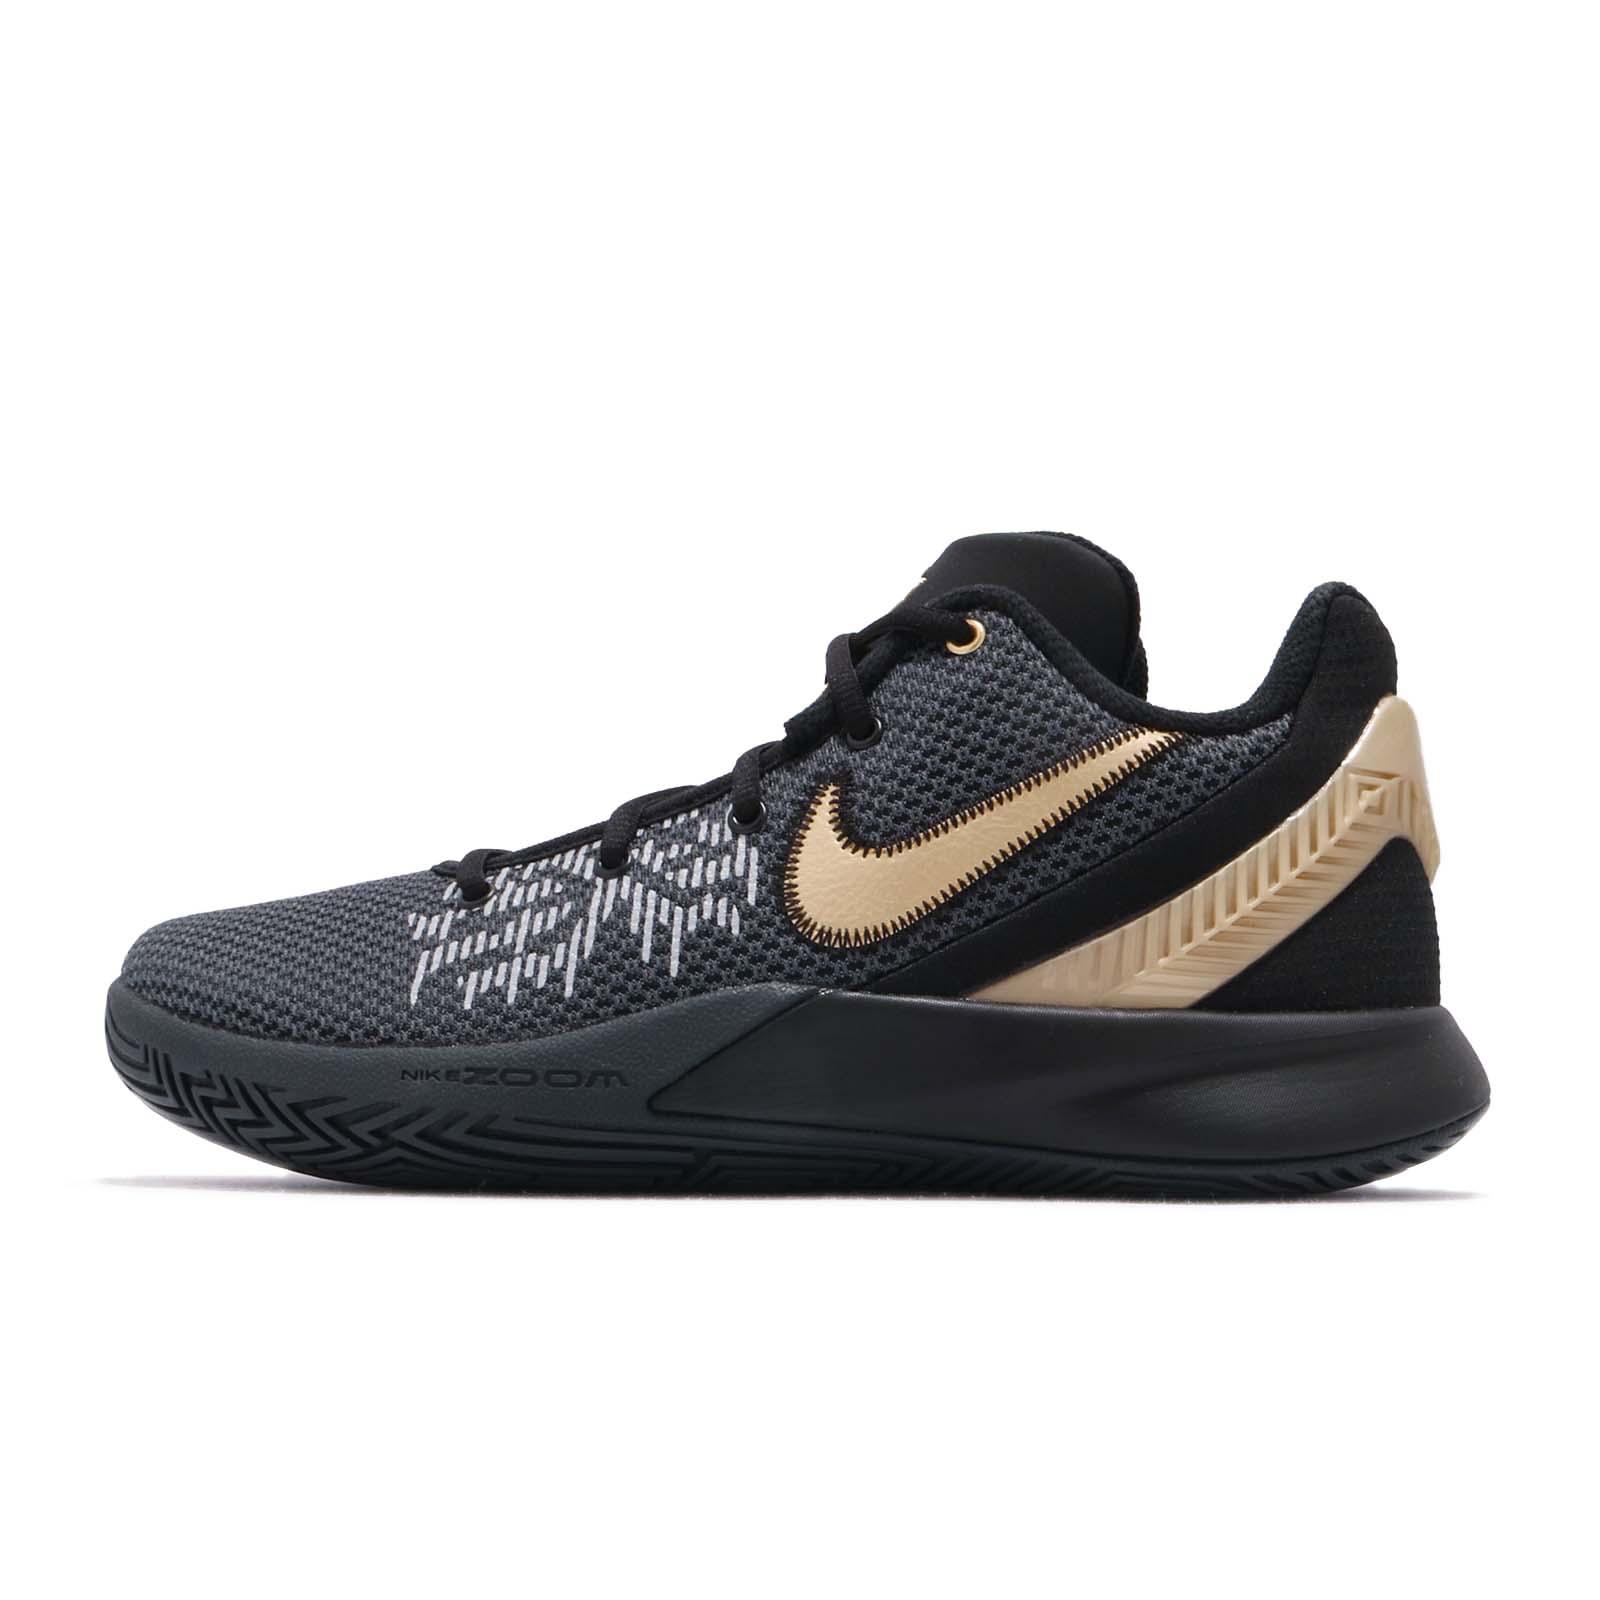 [ALPHA] NIKE KYRIE FLYTRAP 2 EP AO4438-002 男鞋 籃球鞋 Kyrie Irving 平民版